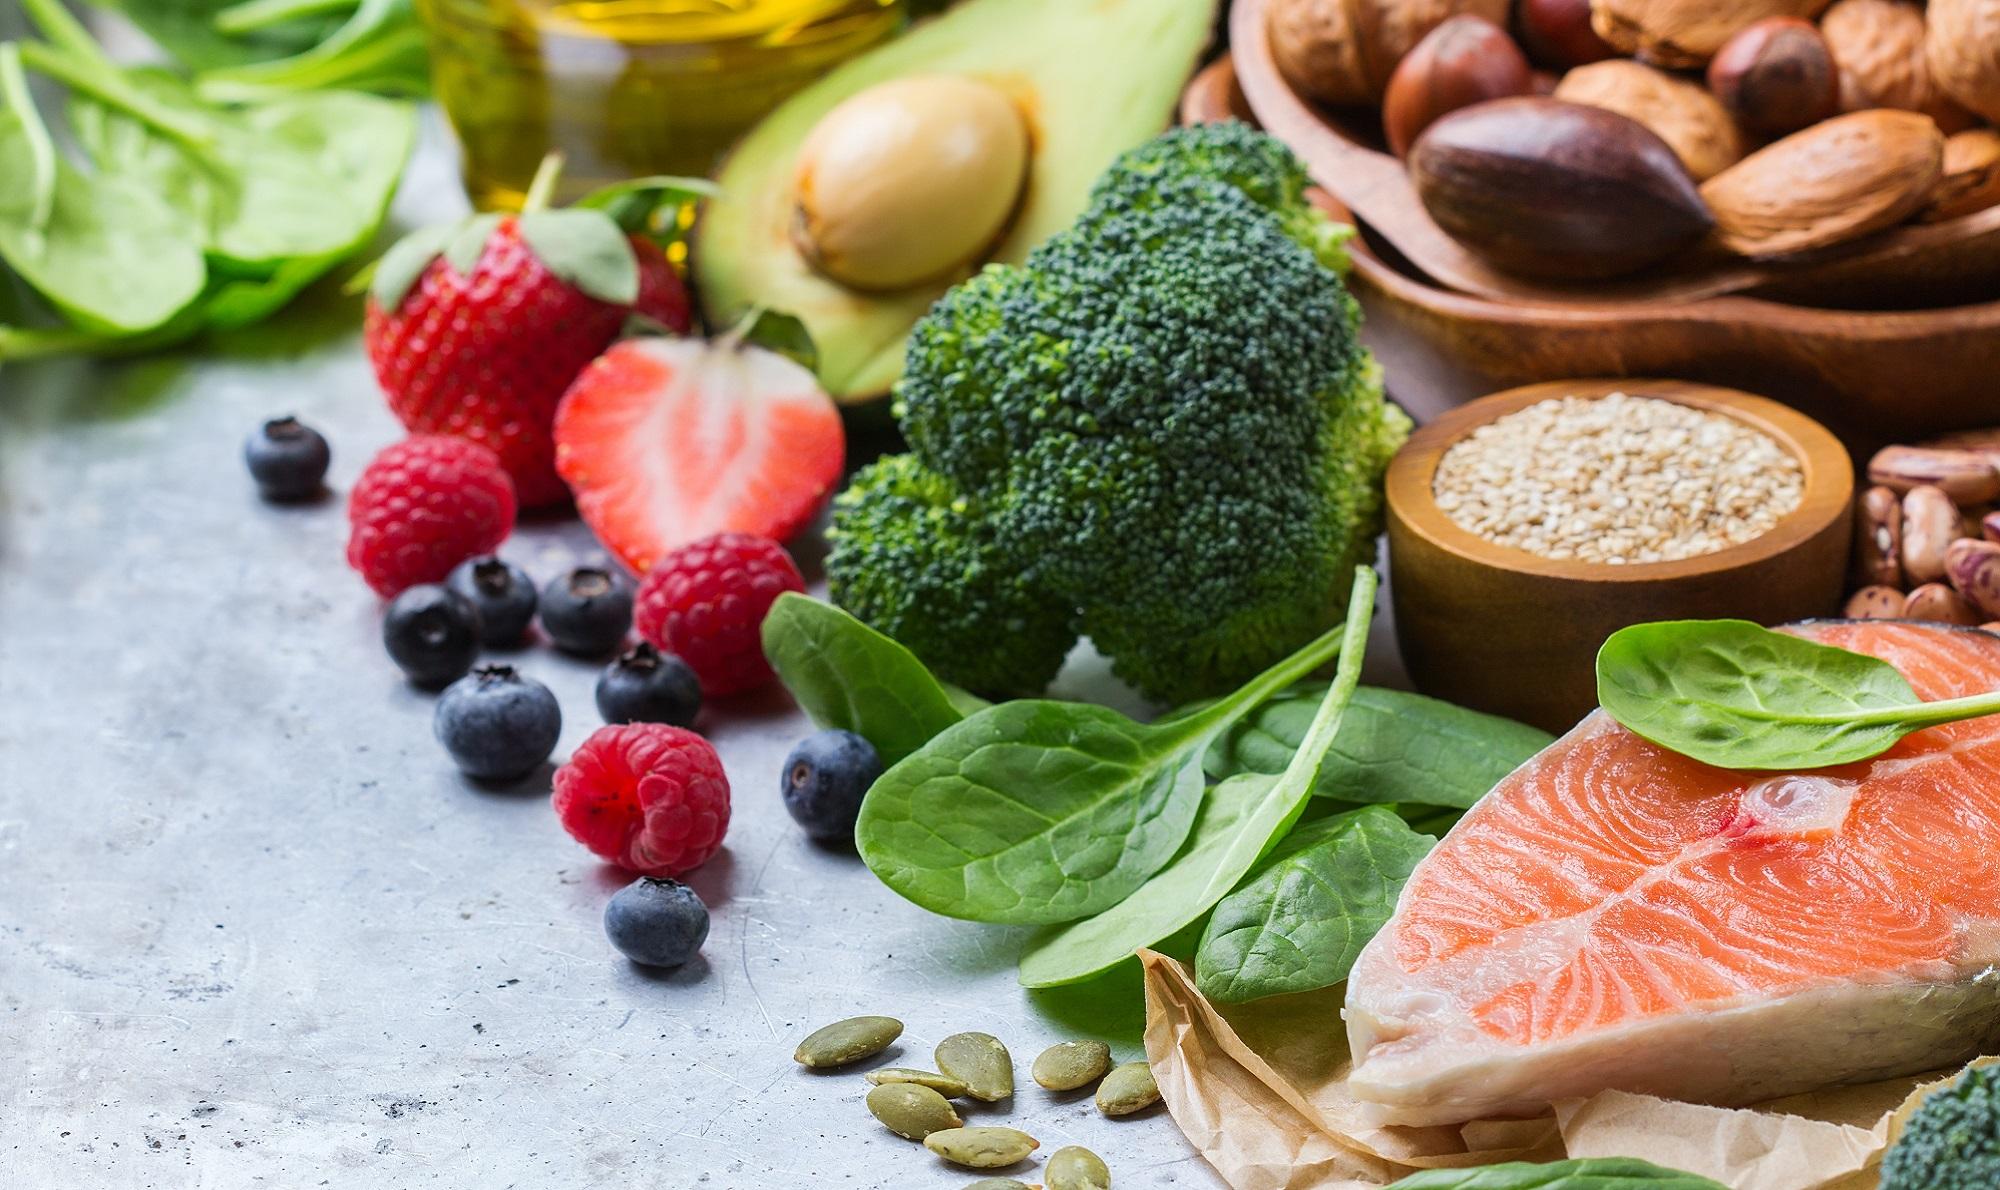 brokula-riba-orasasti-plodovi-maslinovo-ulje-2000_5988205306d91